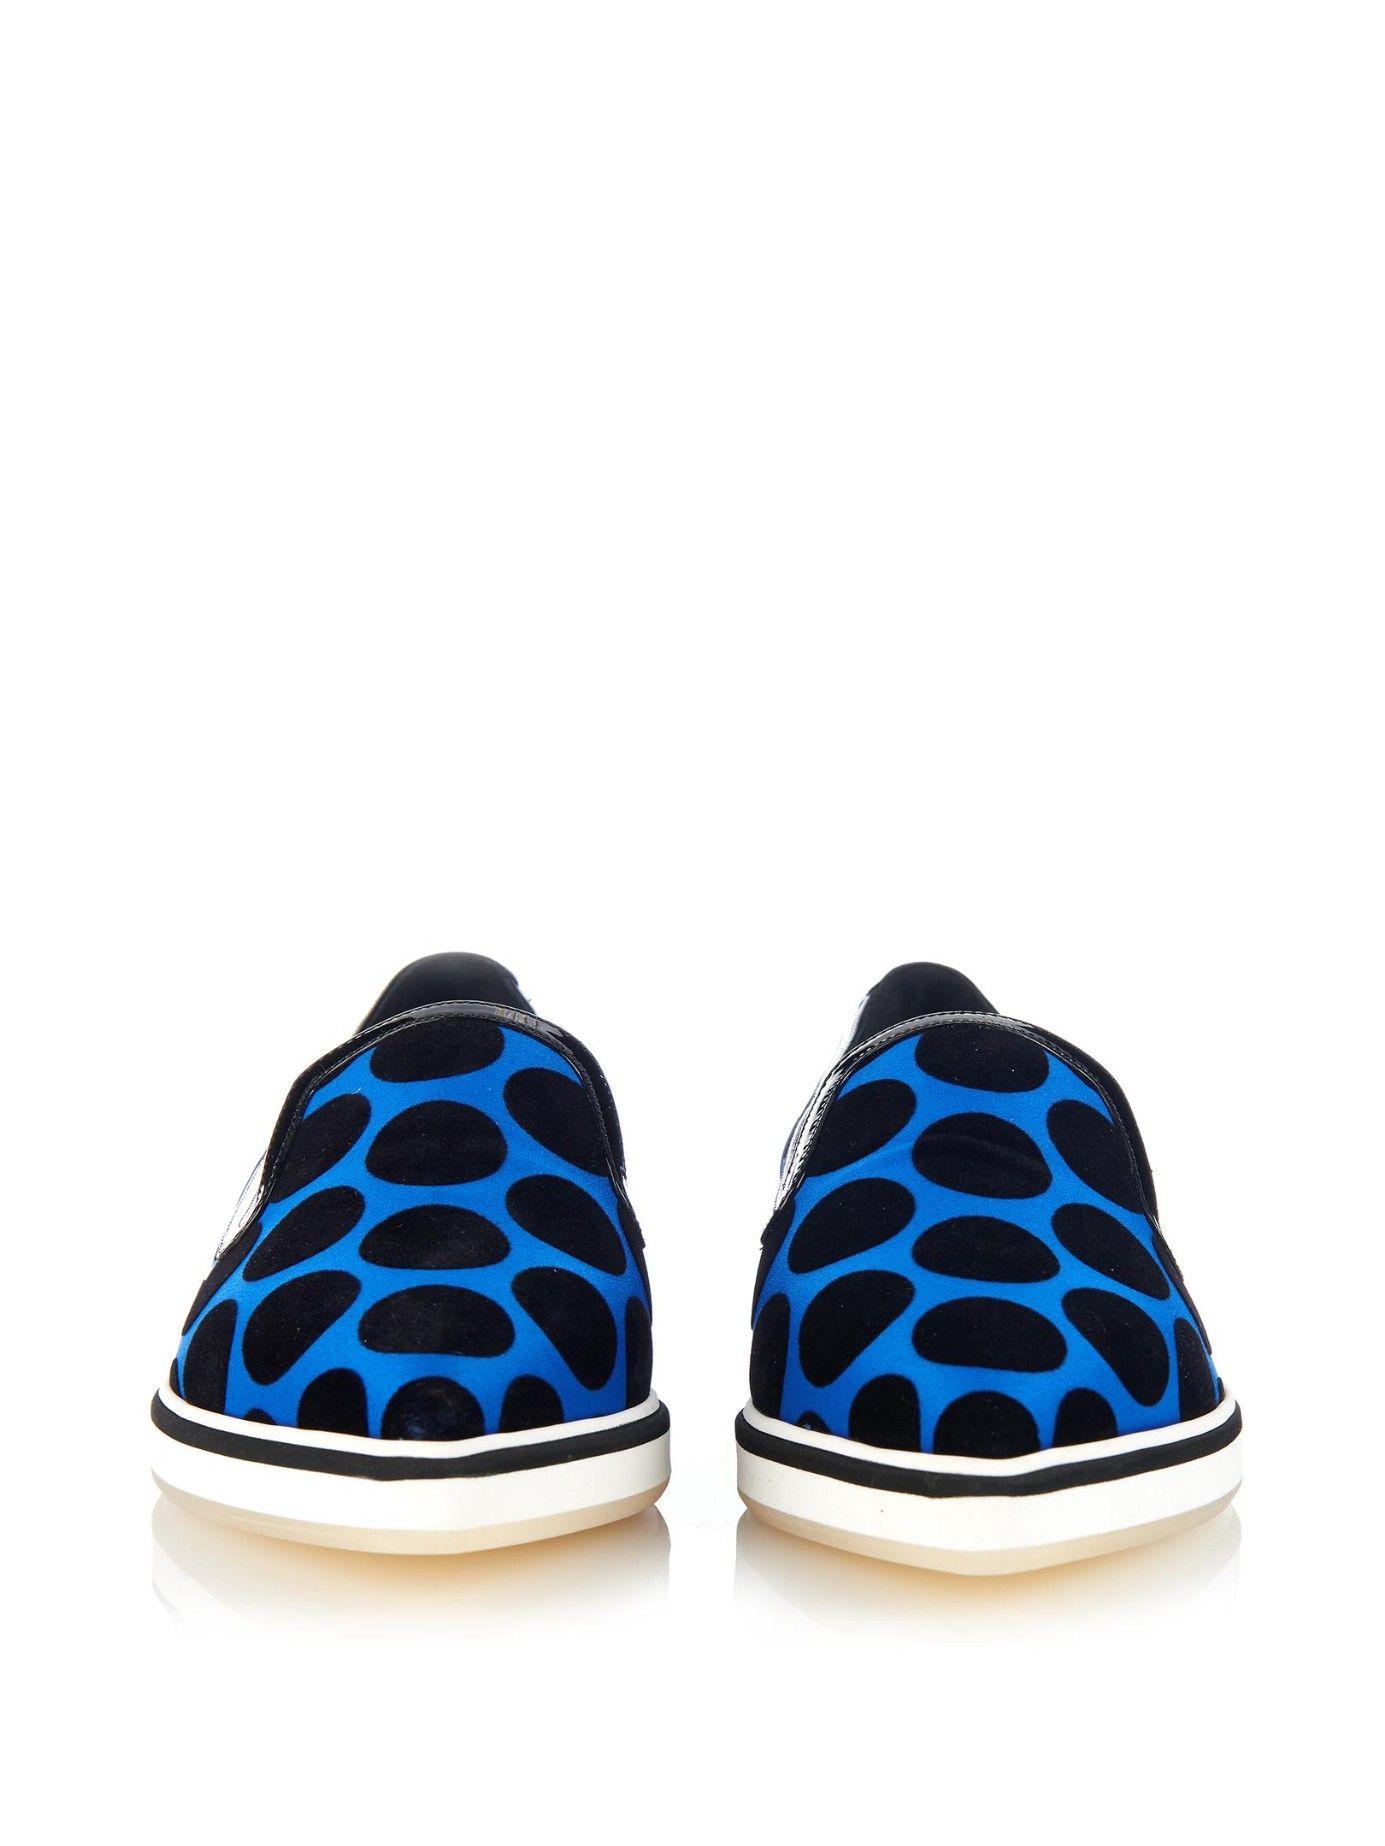 Nicholas Kirkwood Woman Flocked Satin Slip-on Sneakers Blue Size 39.5 Nicholas Kirkwood Buy Cheap Brand New Unisex Cheap Ebay Cheap Sale Very Cheap wRqlEIwyl